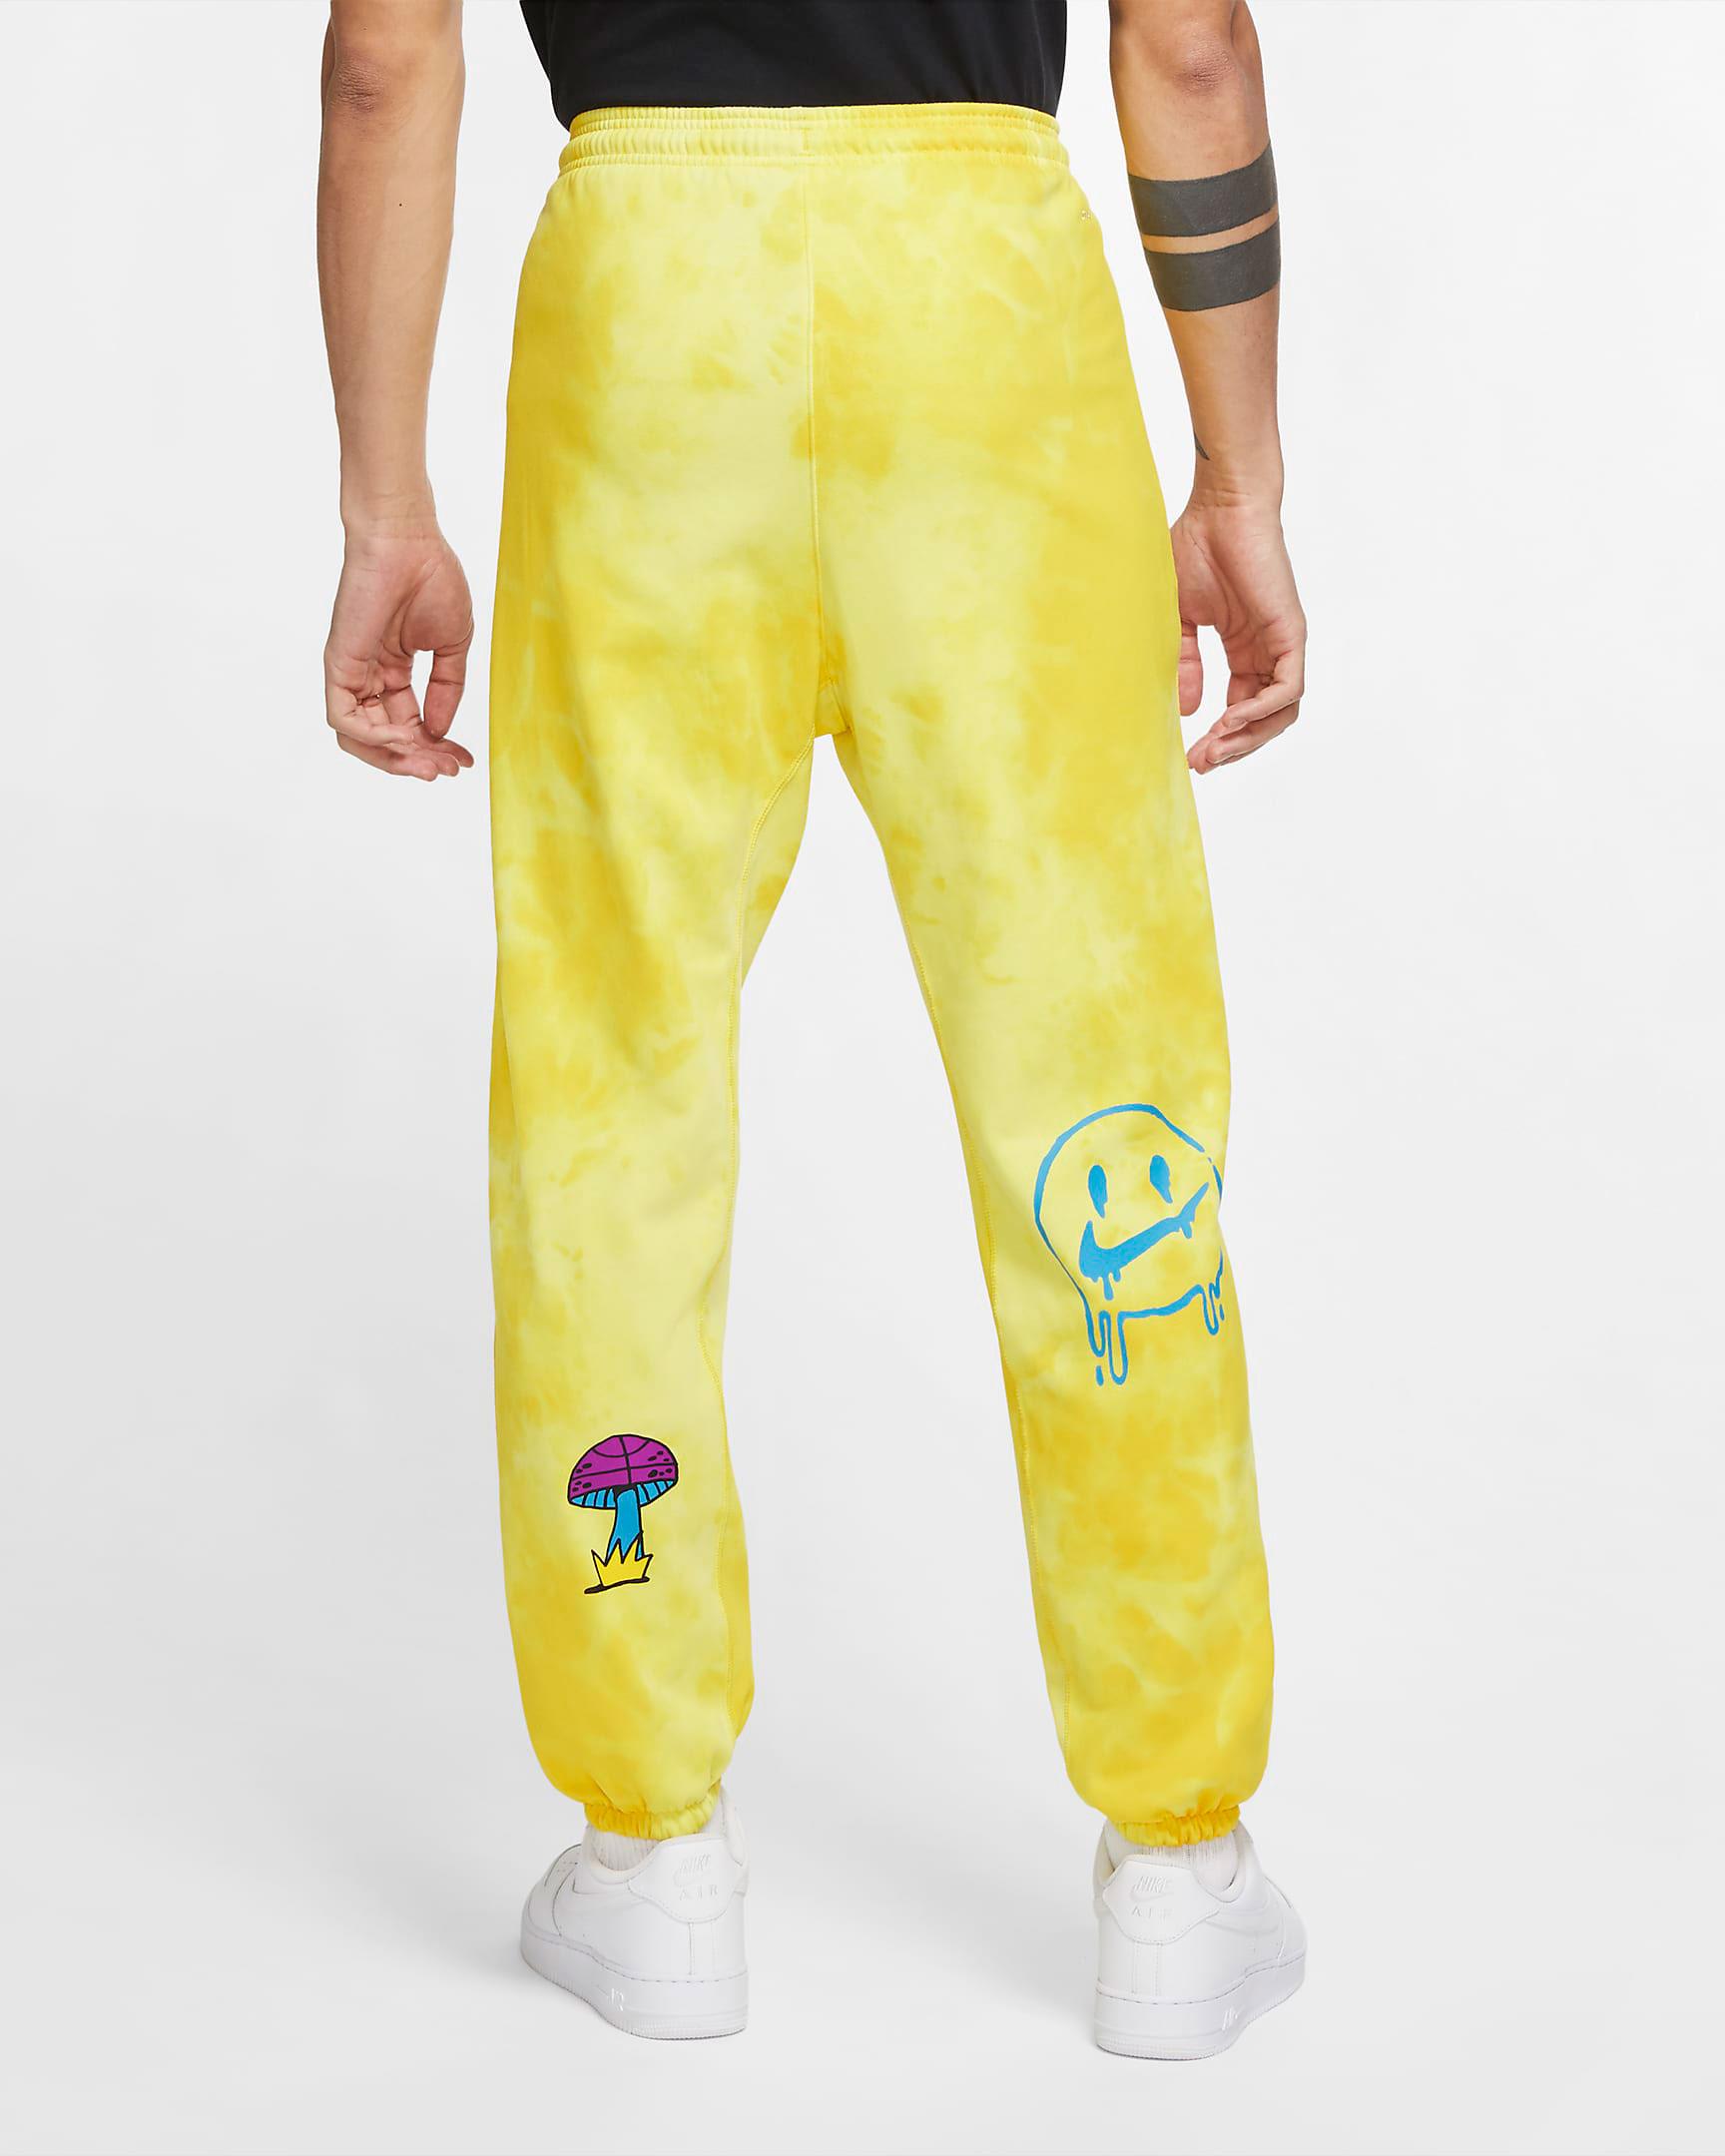 nike-peace-love-basketball-pants-yellow-2